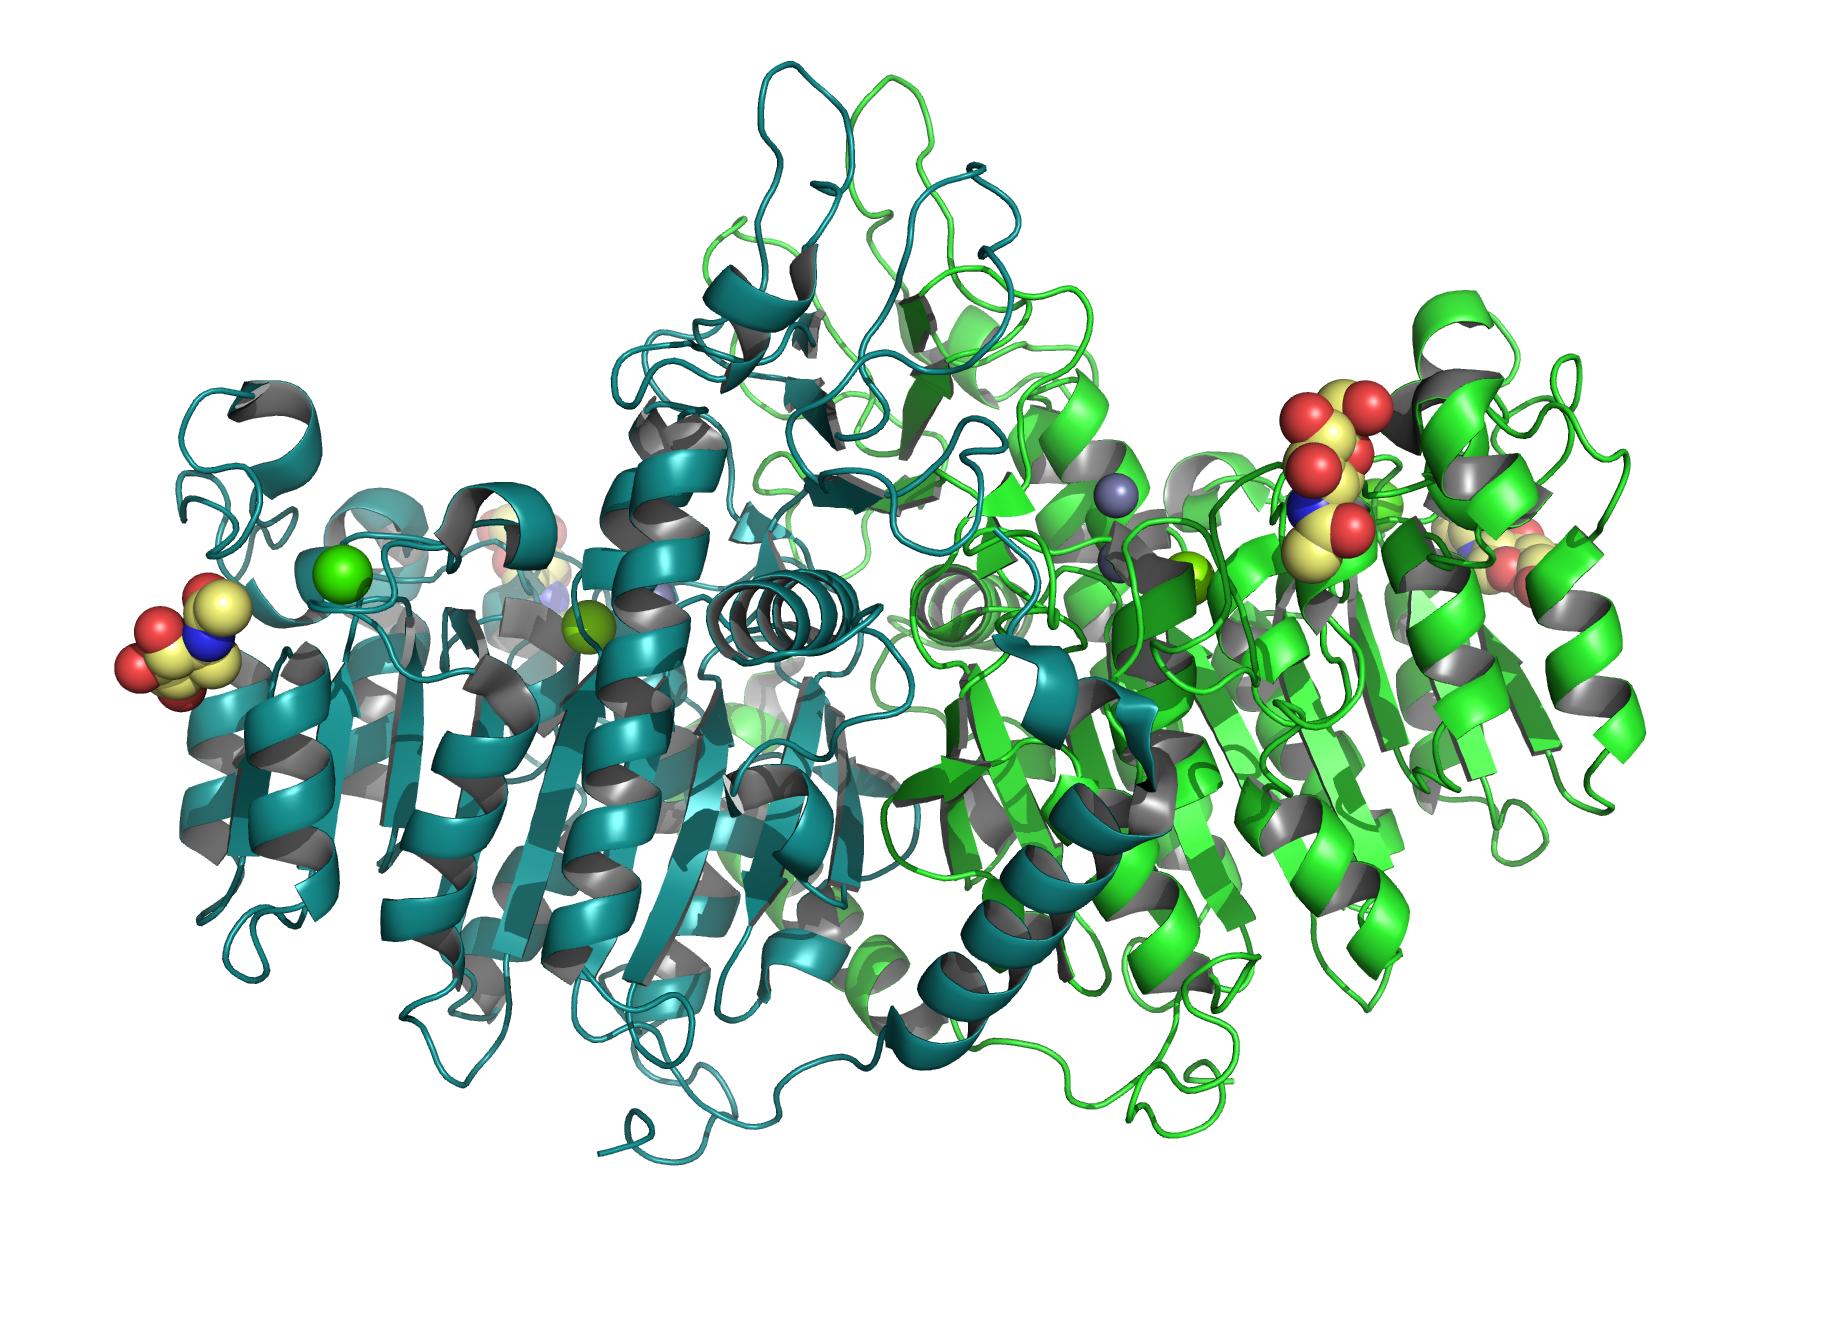 placental alkaline phosphatase wikipedia